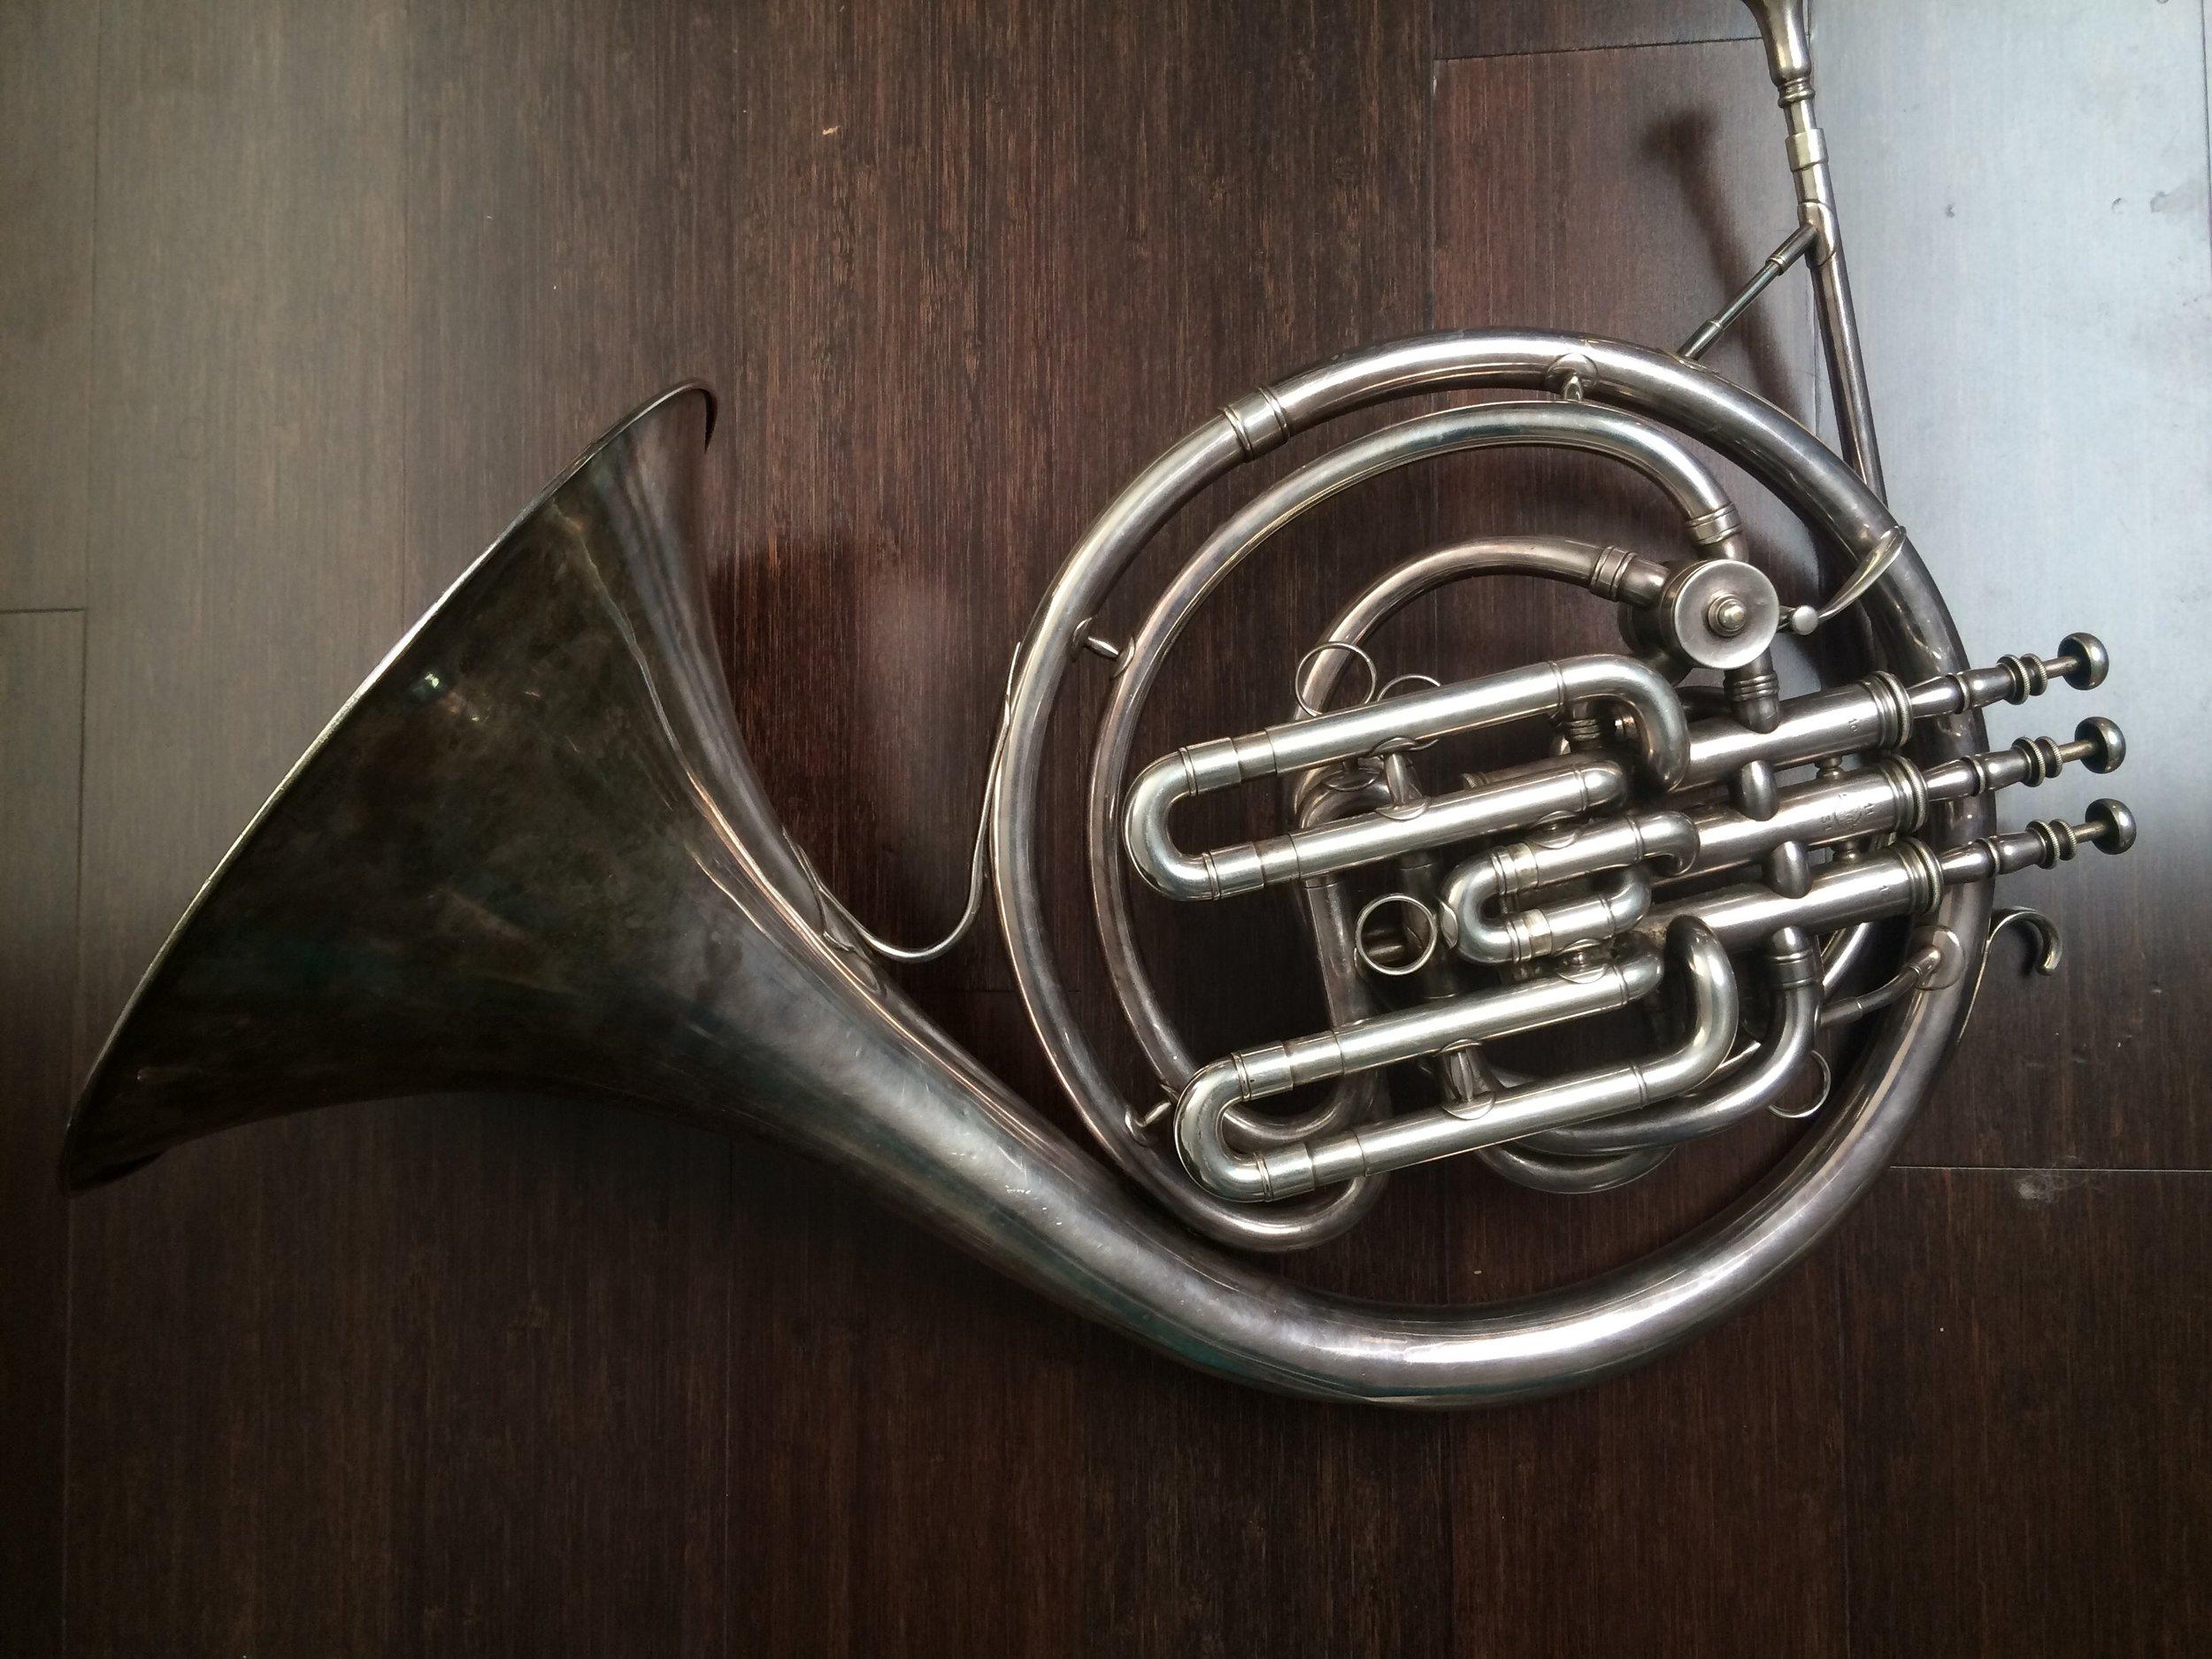 Henri Selmer  F/B flat piston valve horn ( cor ascendant    i.e. with ascending third valve ),  early 20th century.